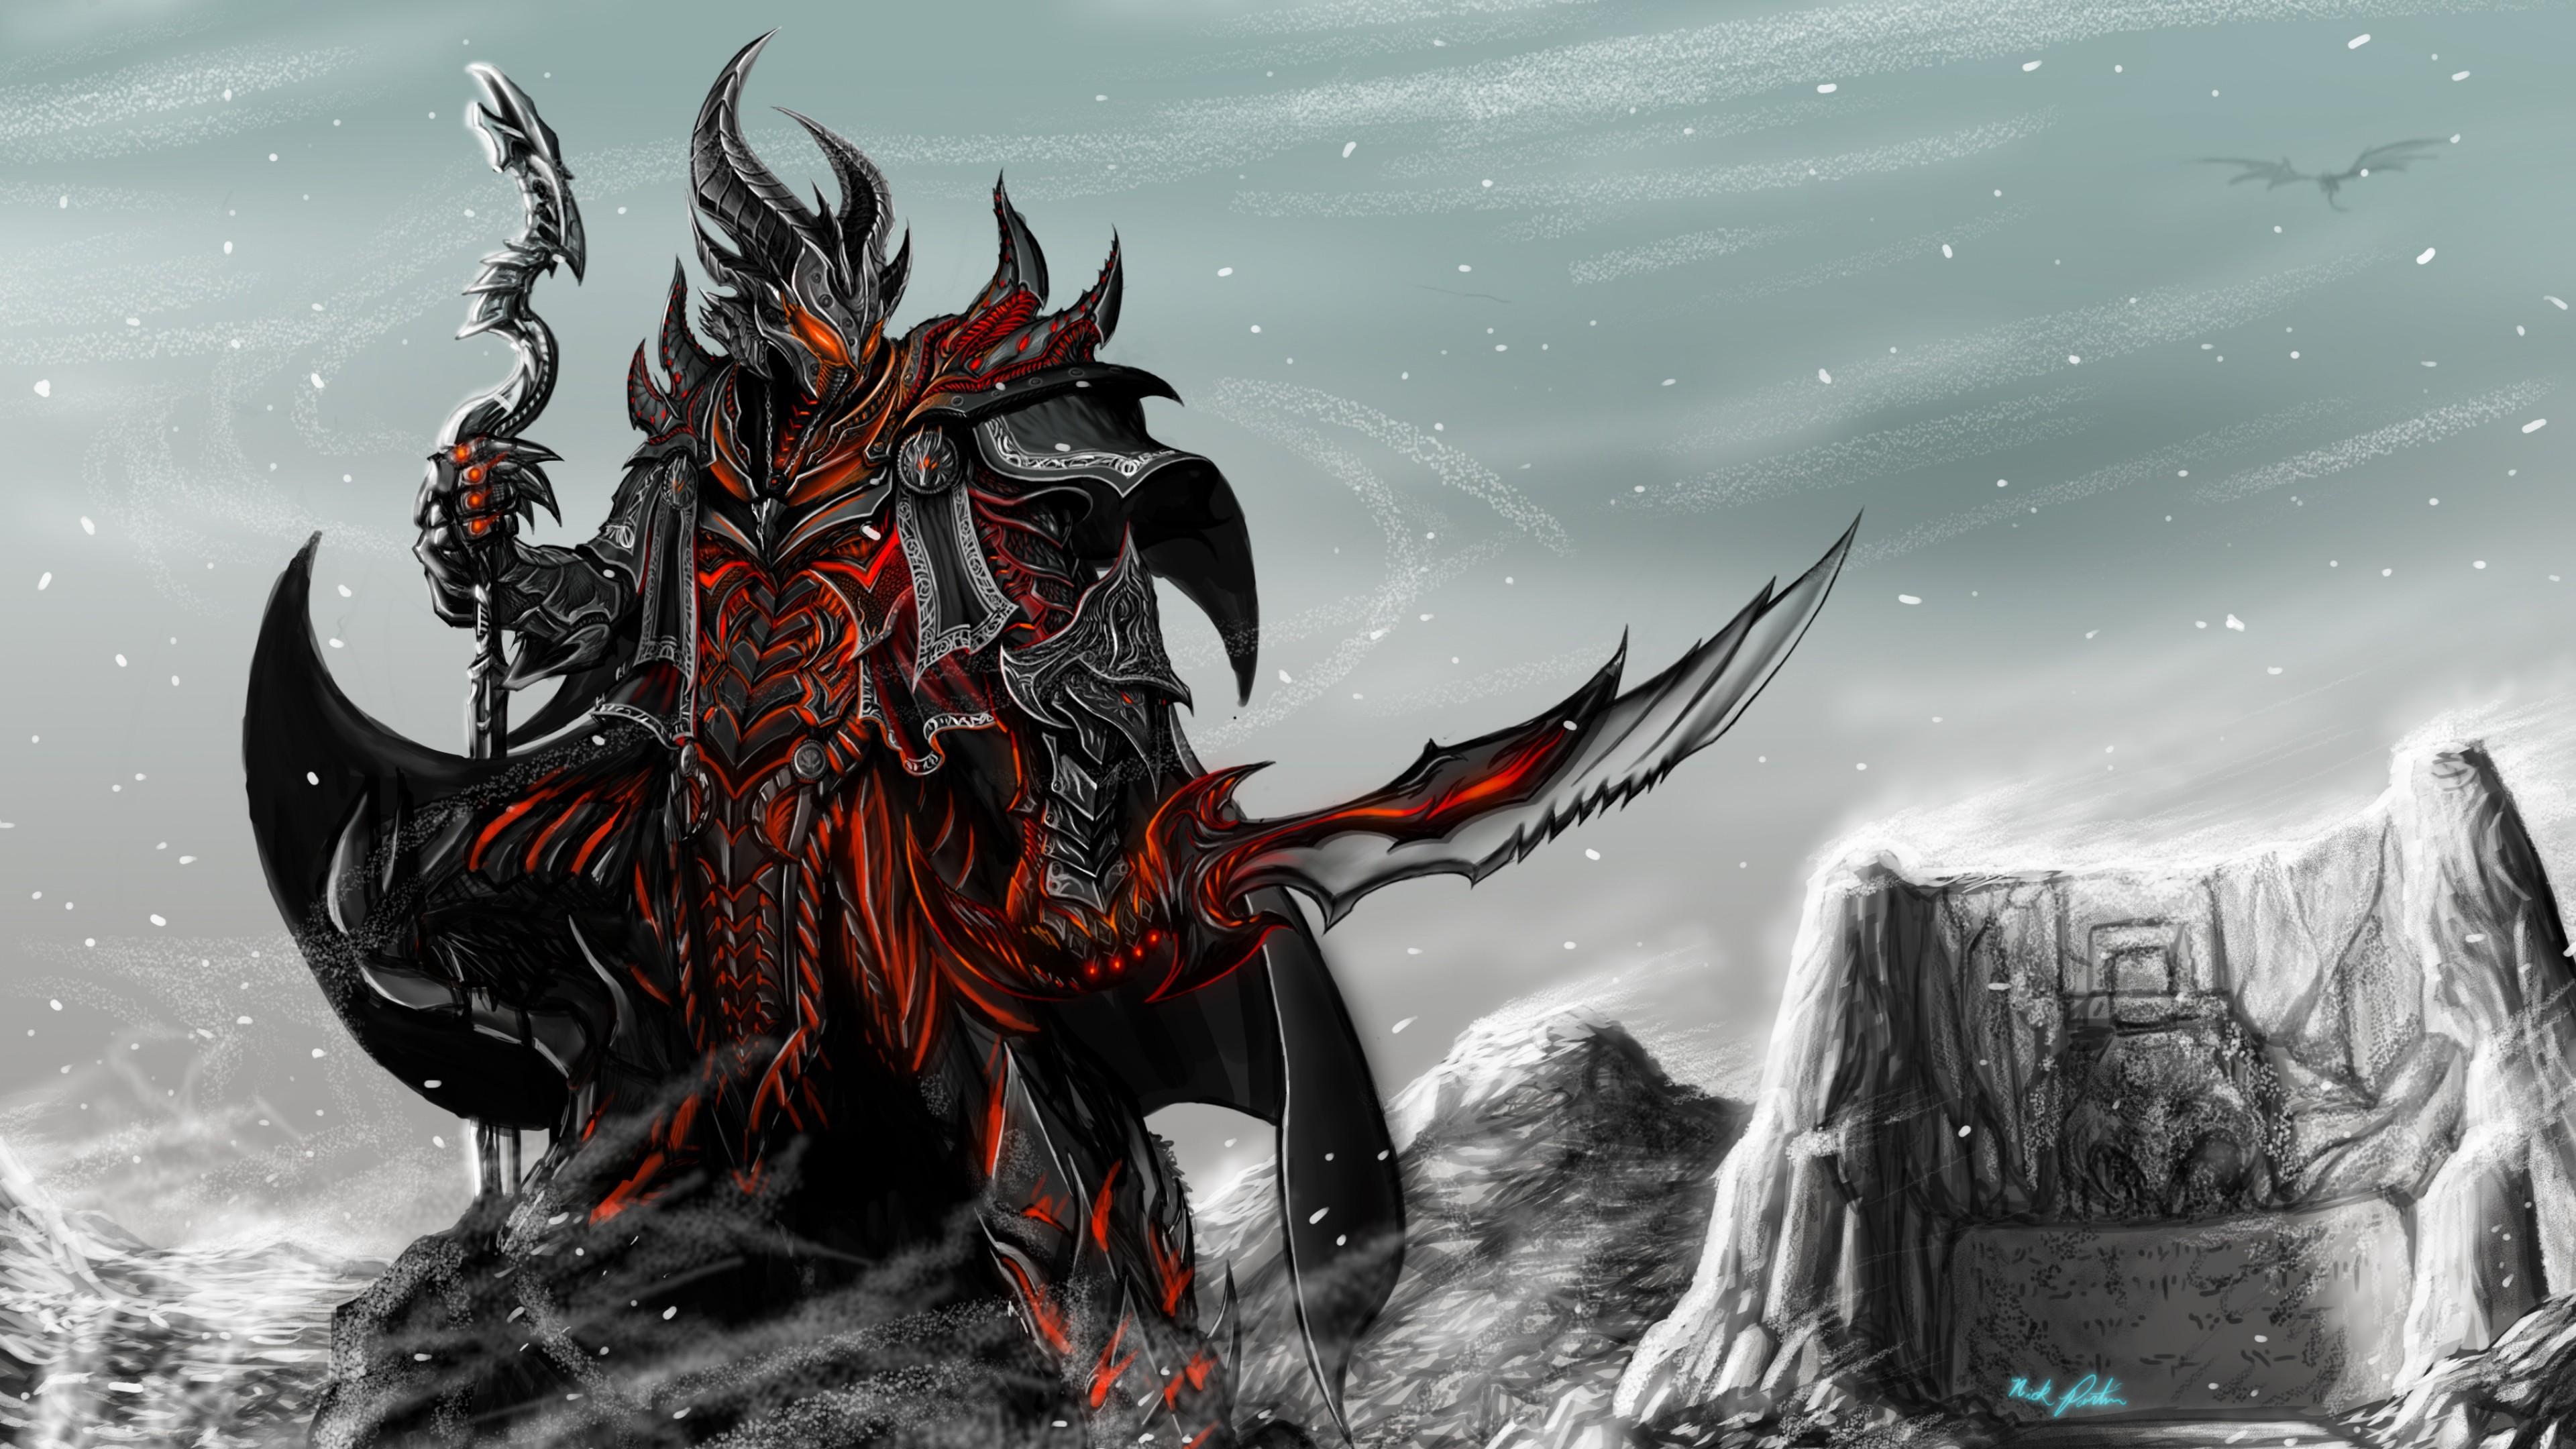 Preview wallpaper skyrim, game, art, rider, armor, staff, sword 3840×2160